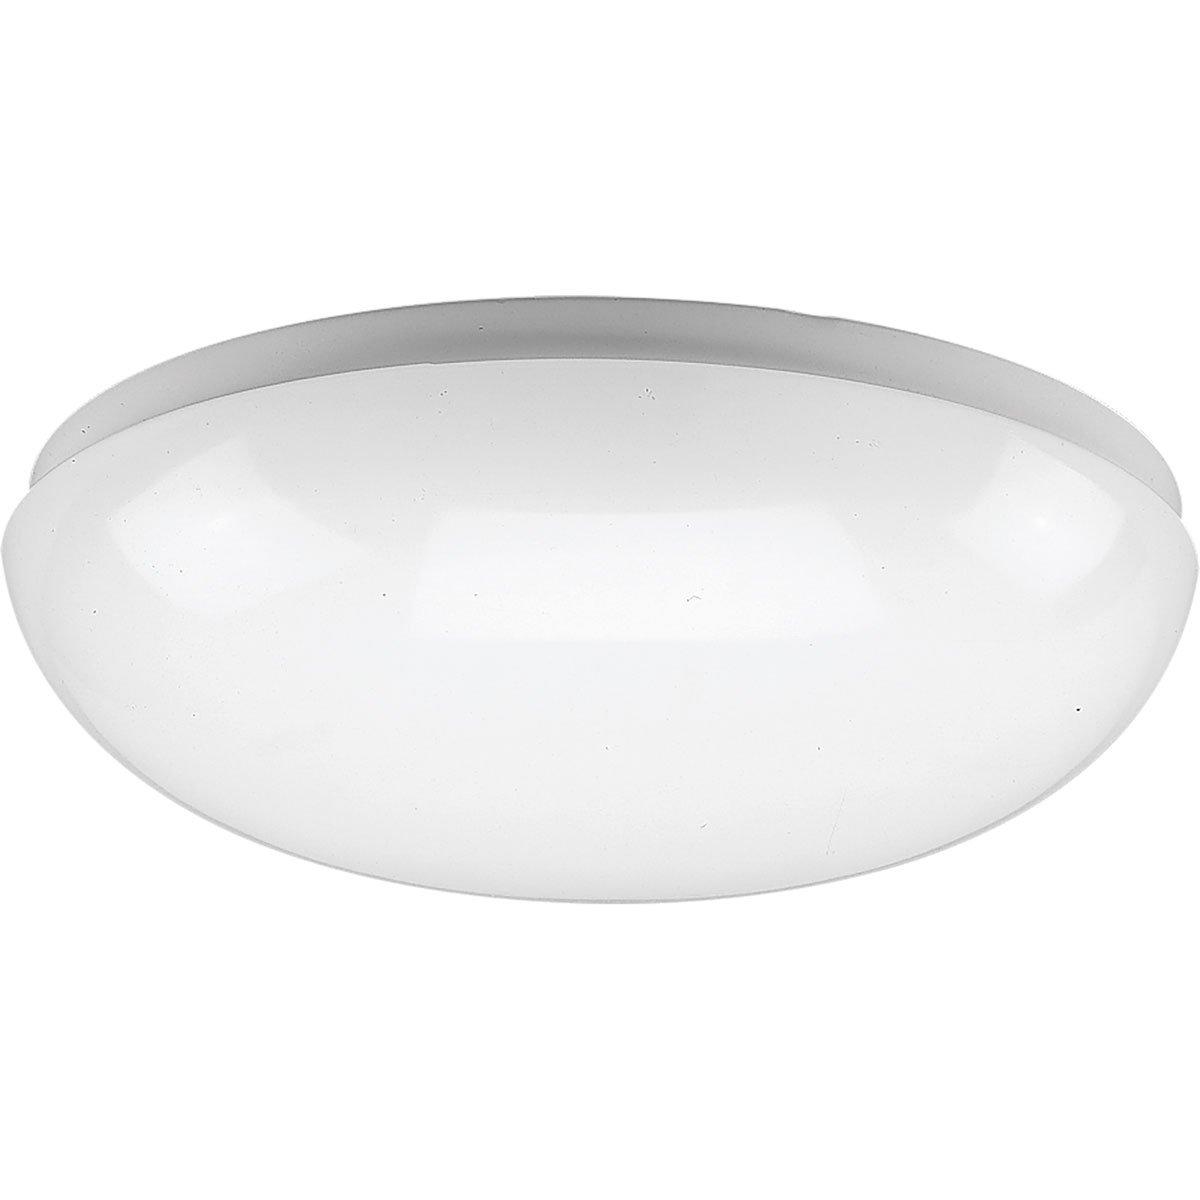 Progress Lighting P7385-3030K9 1 Light LED Ceiling with AC Module by Progress Lighting (Image #1)